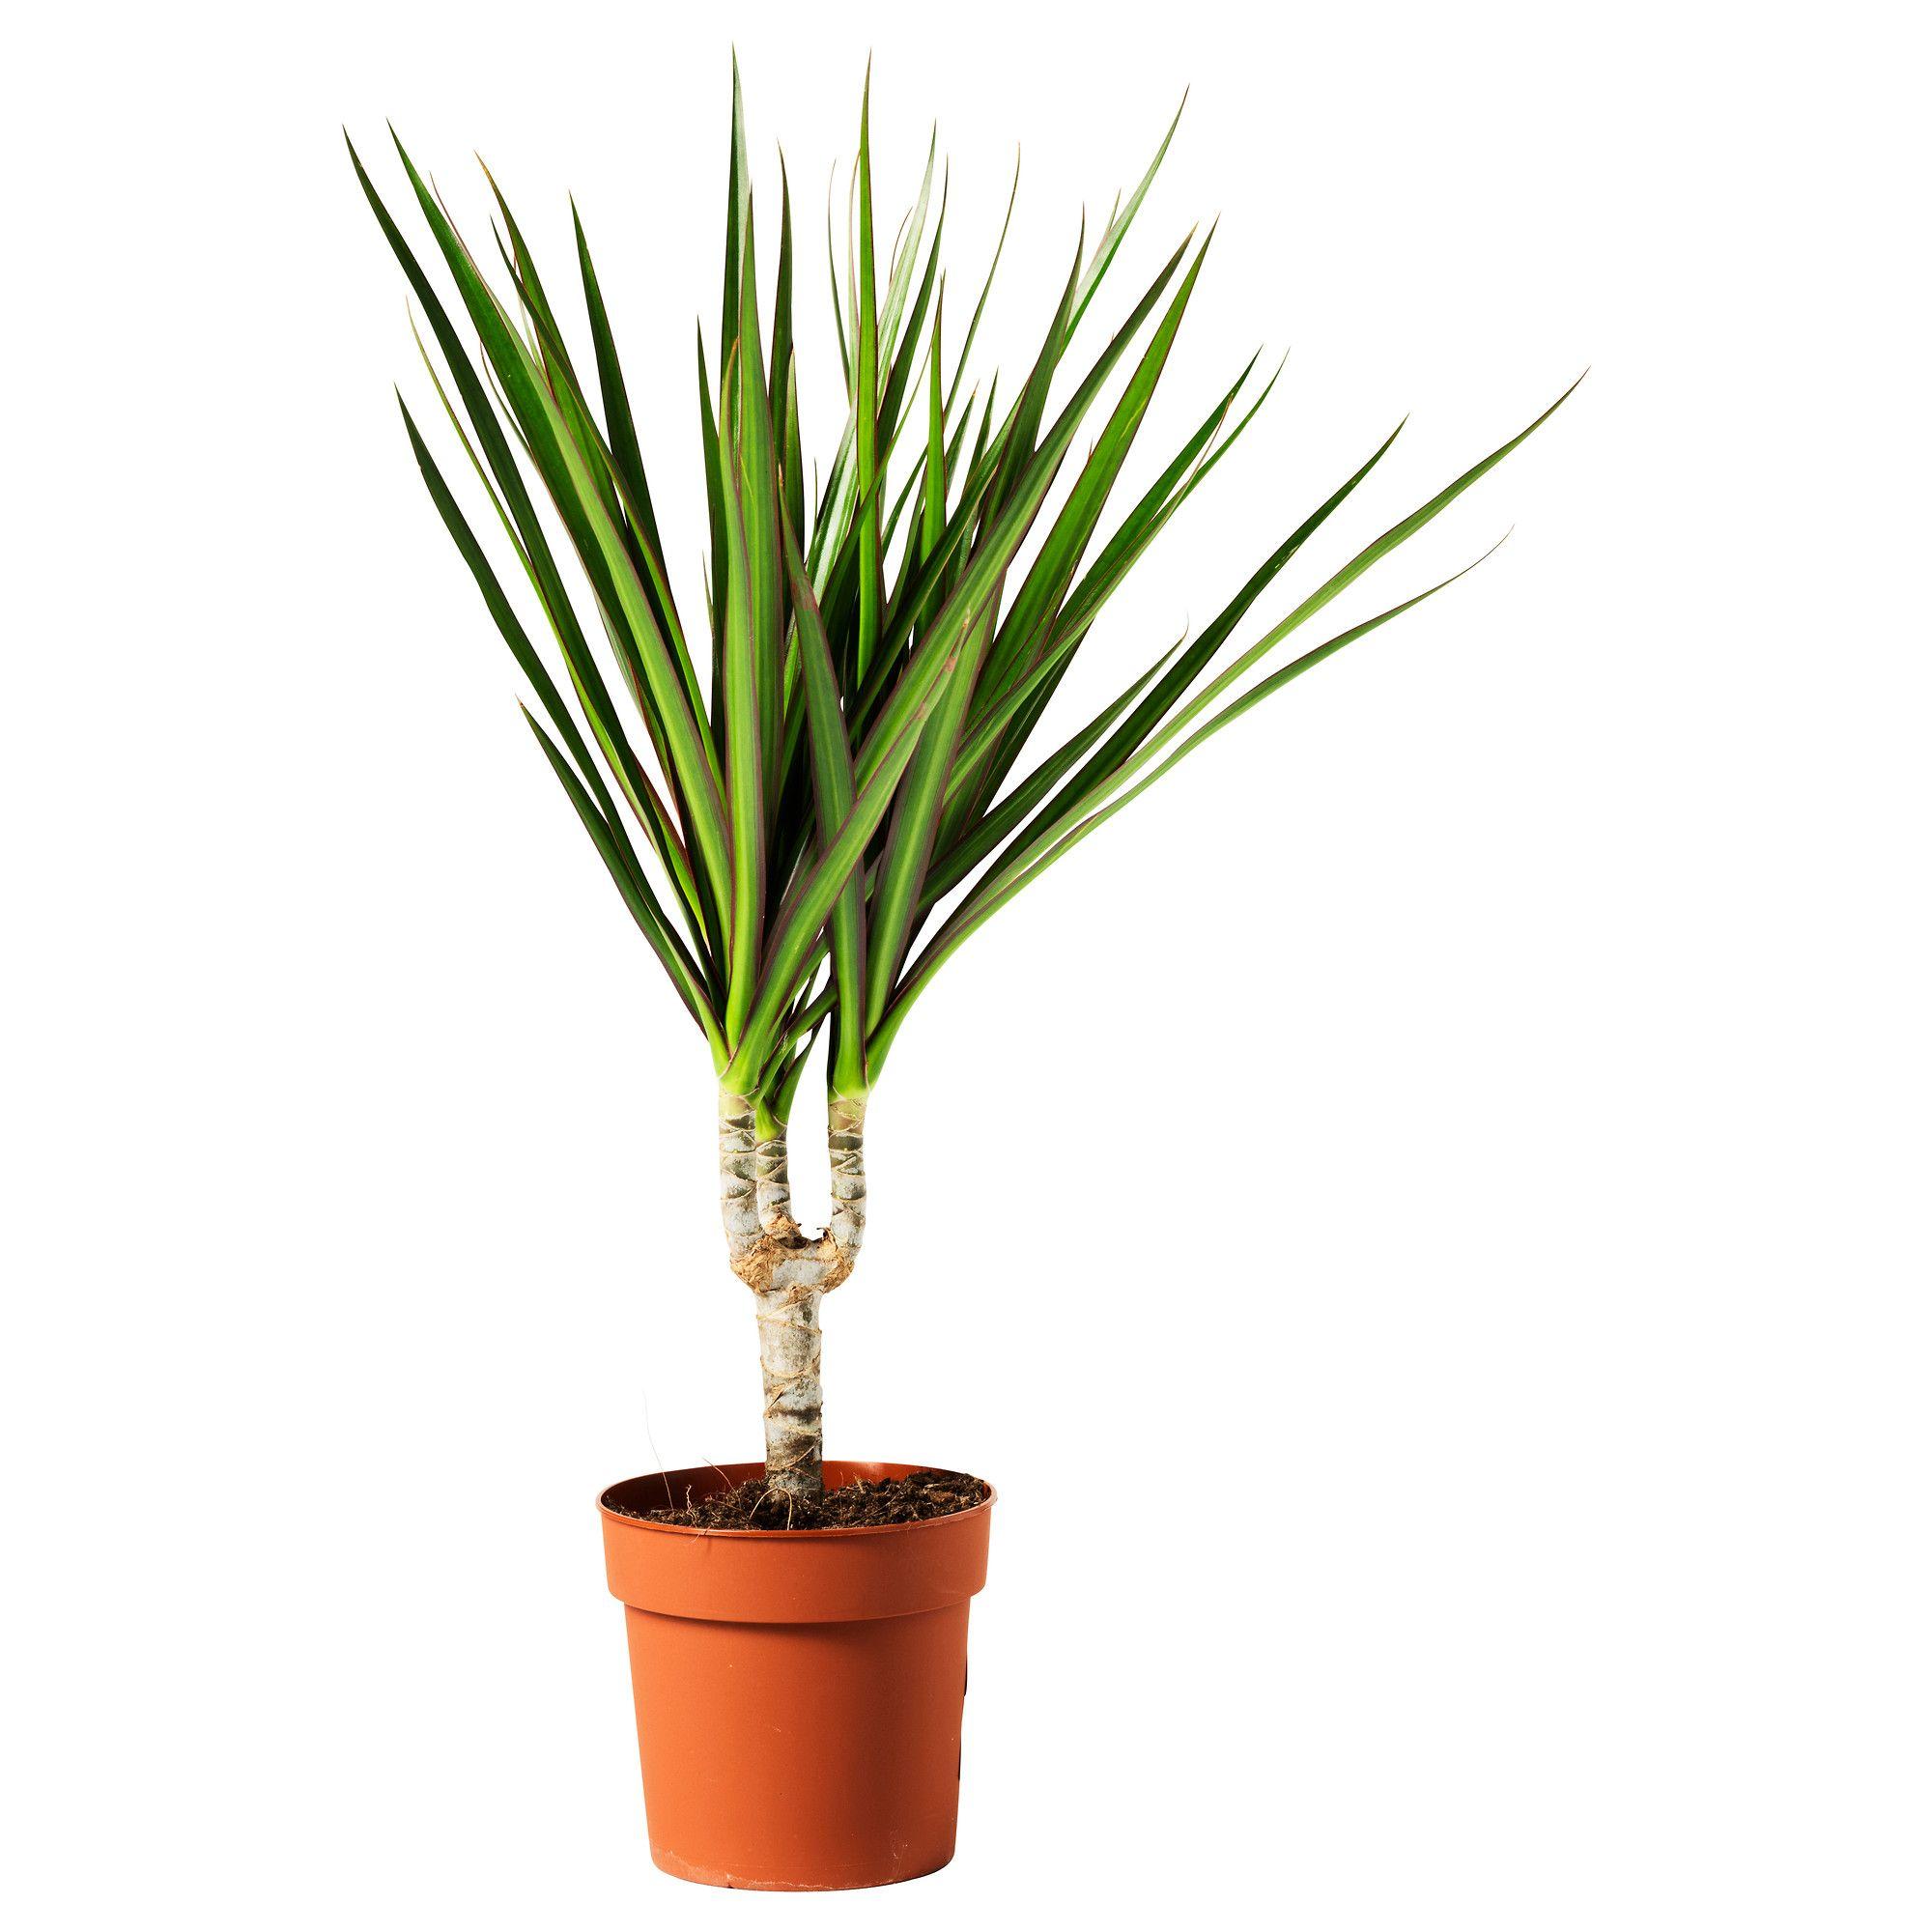 Dracaena Marginata Potted Plant Dragon Tree 1 Stem 4